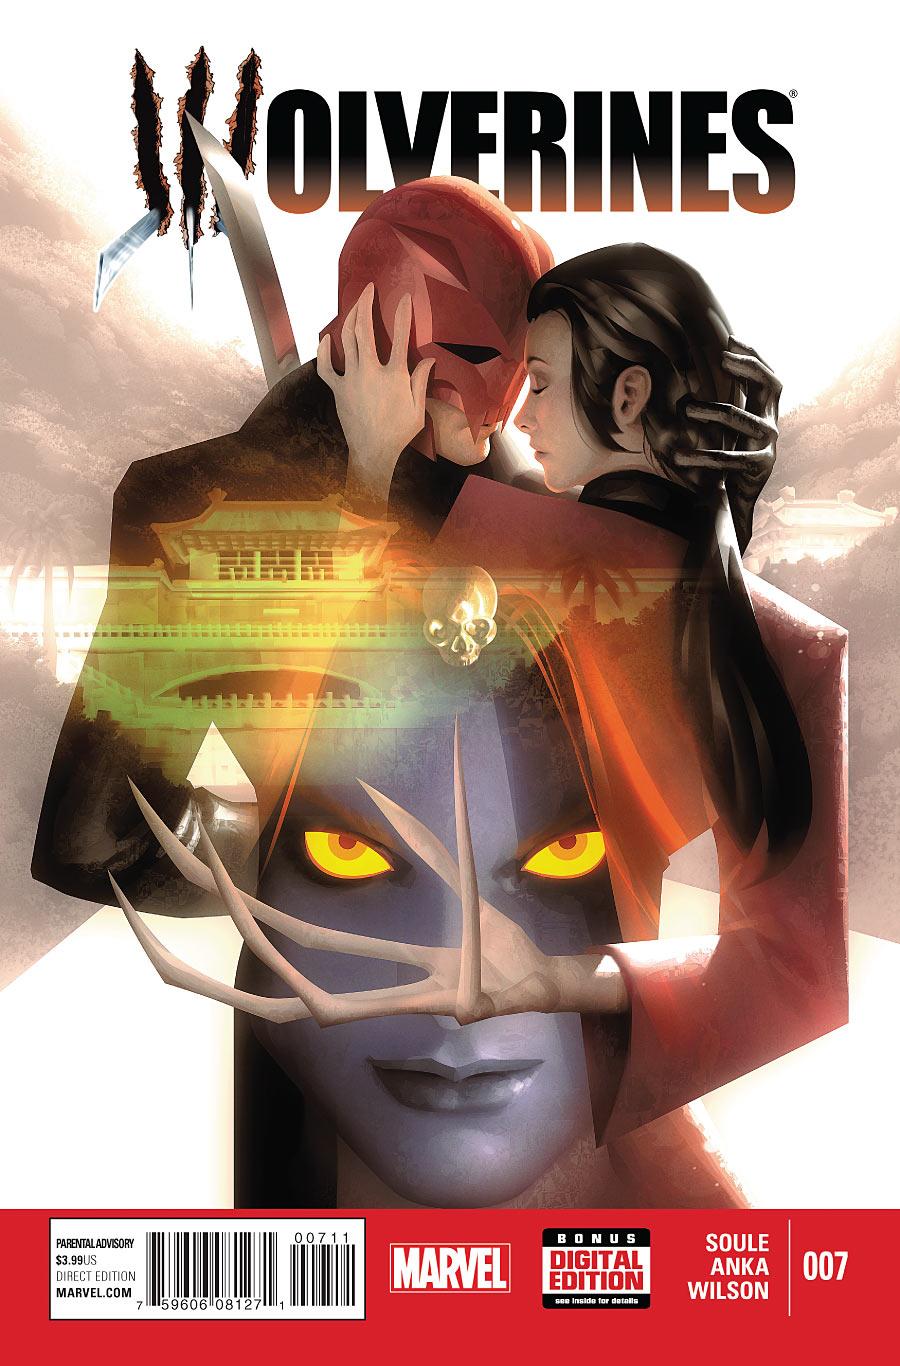 Wolverines #7 - copertina